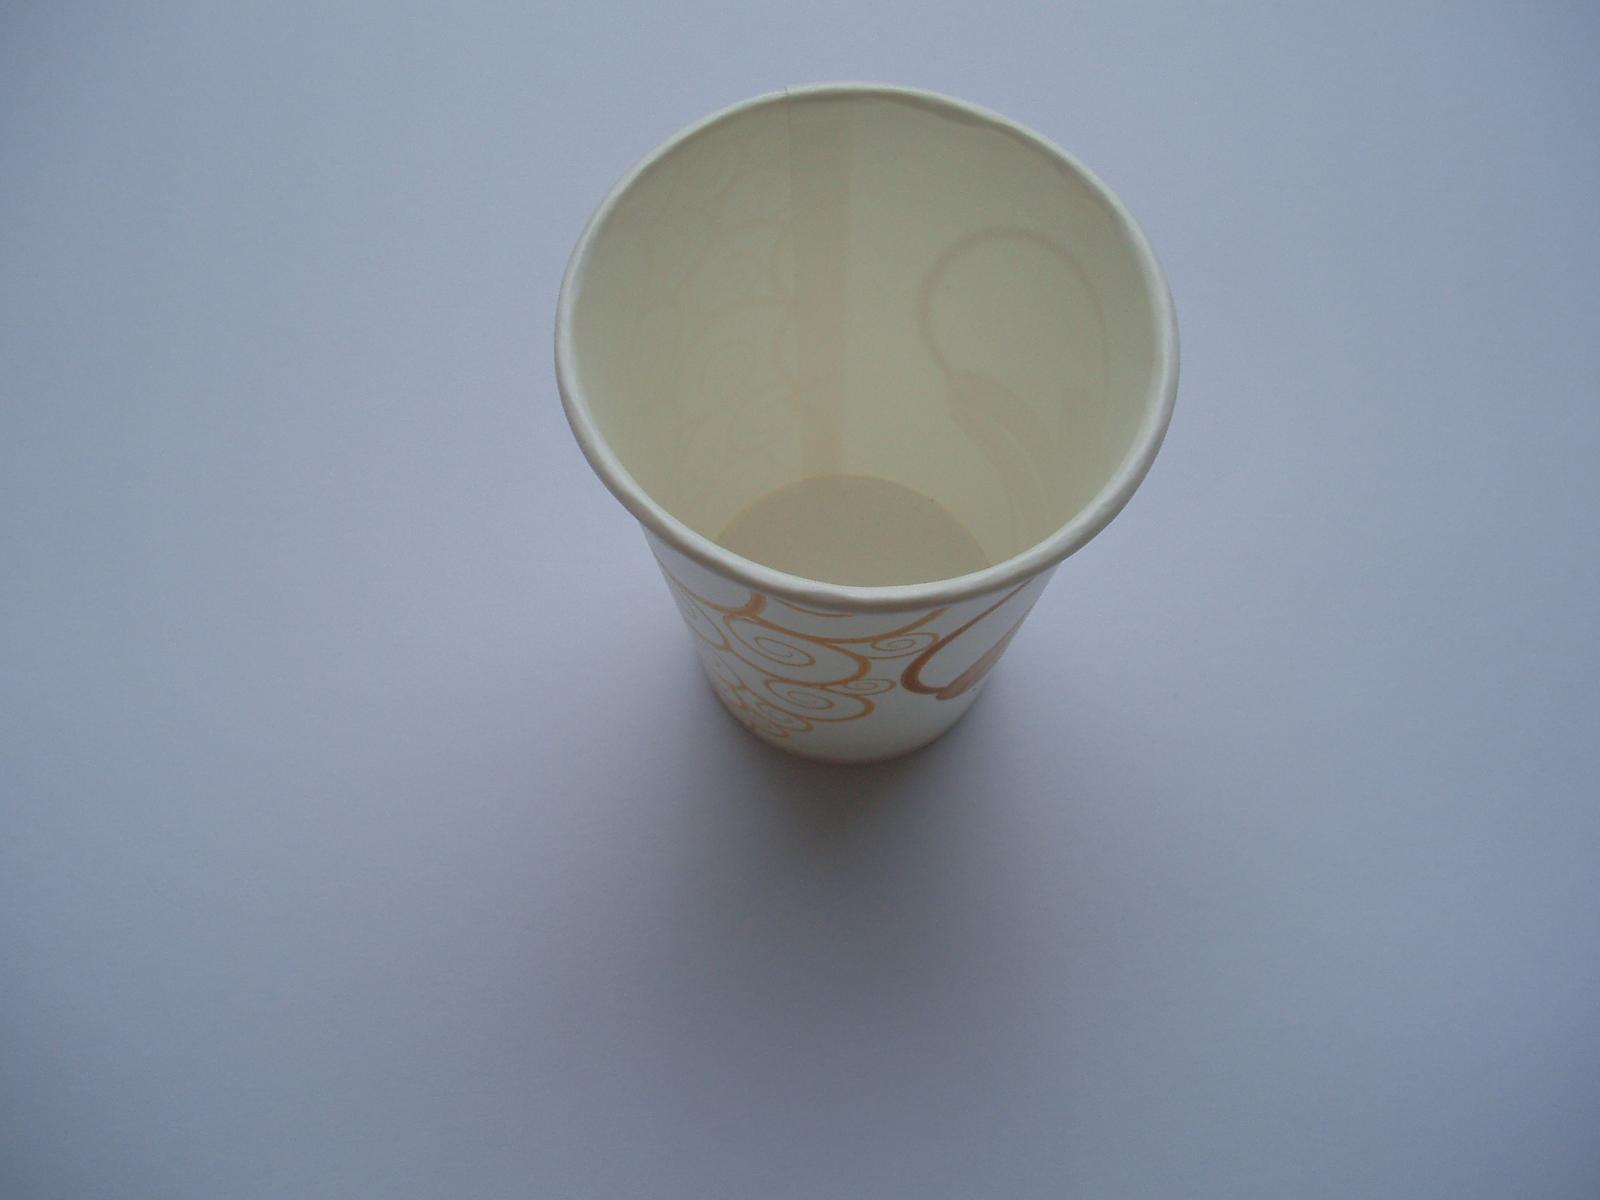 papírový pohárek - Obrázek č. 2